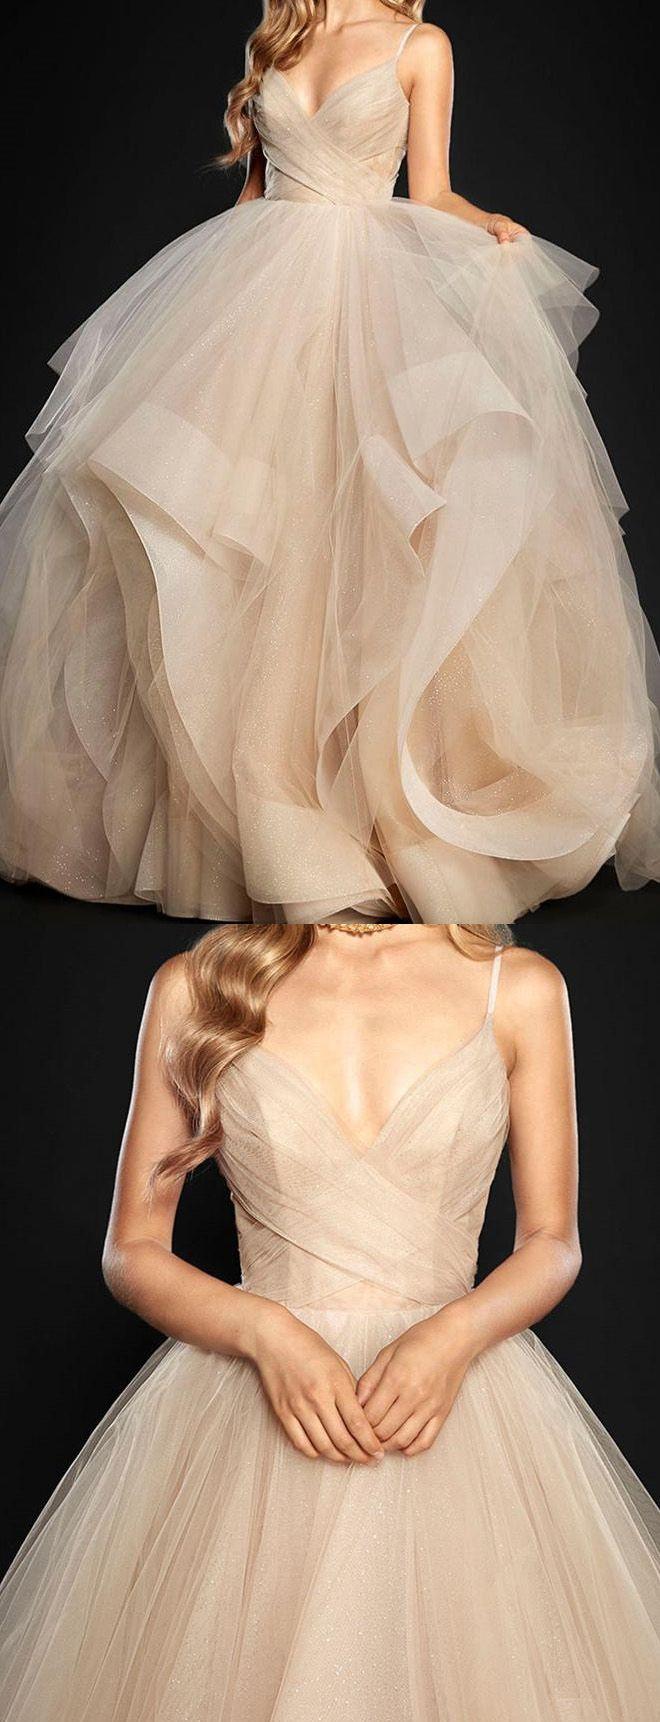 Long prom dresses champagne prom dresses prom dresses long prom